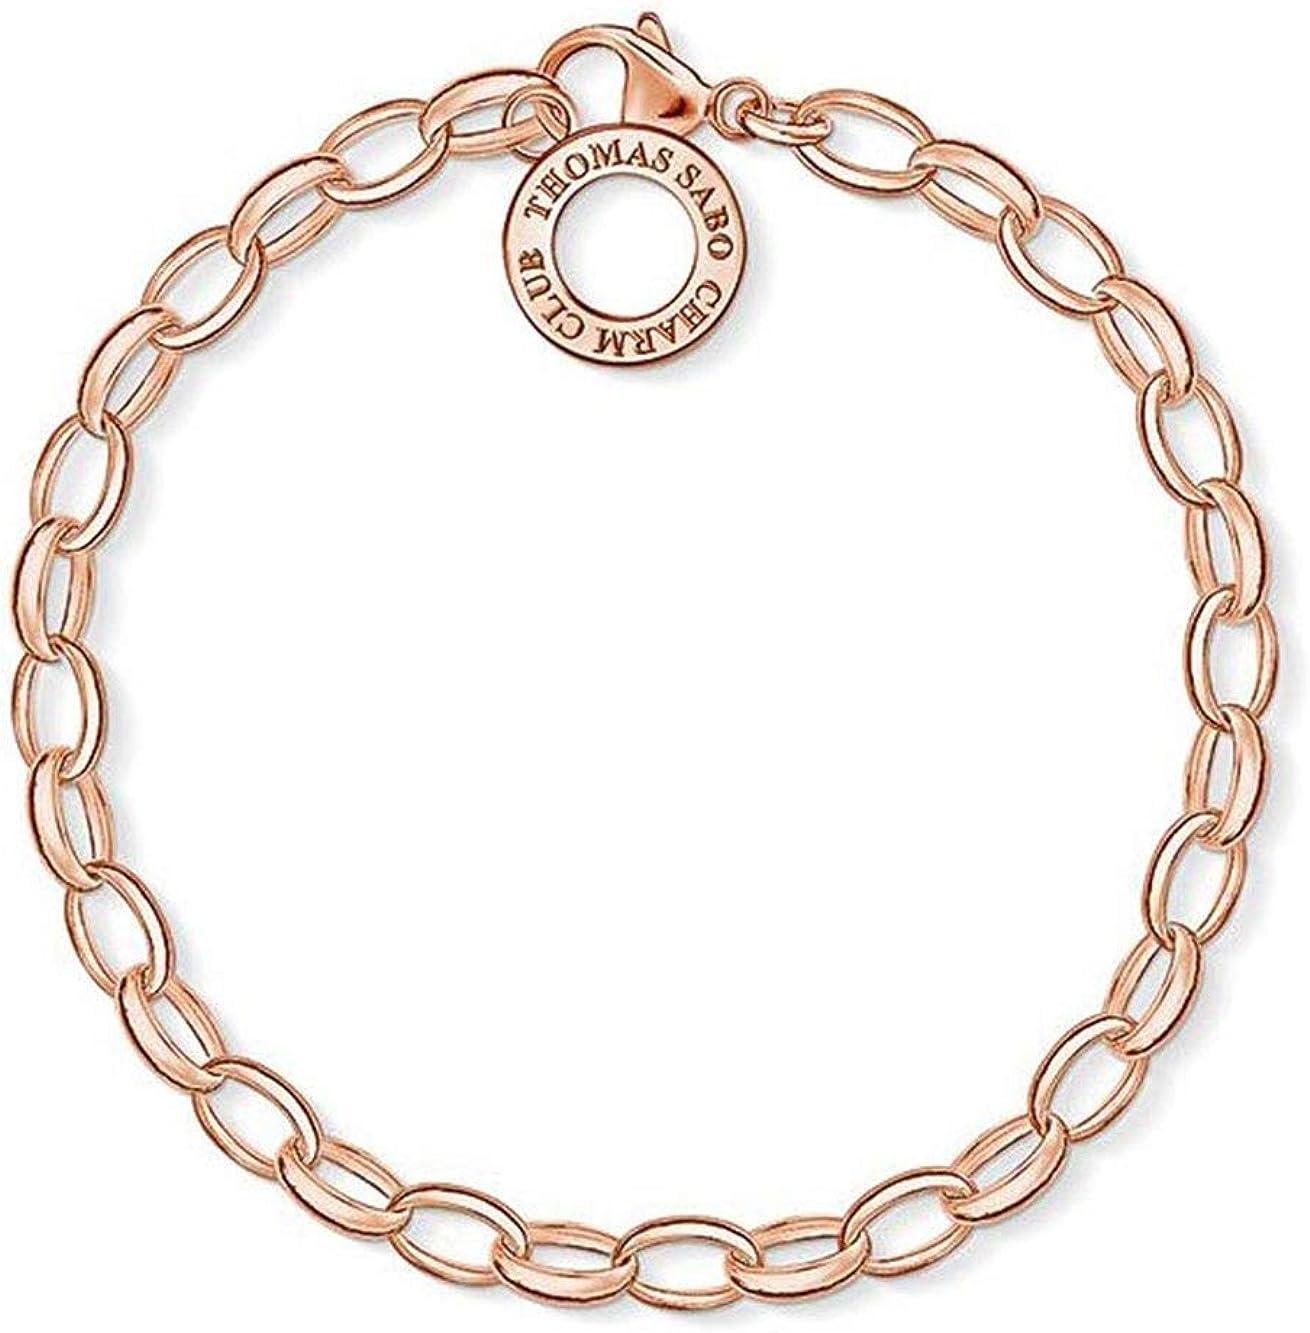 Thomas Sabo Charm Bracelet...